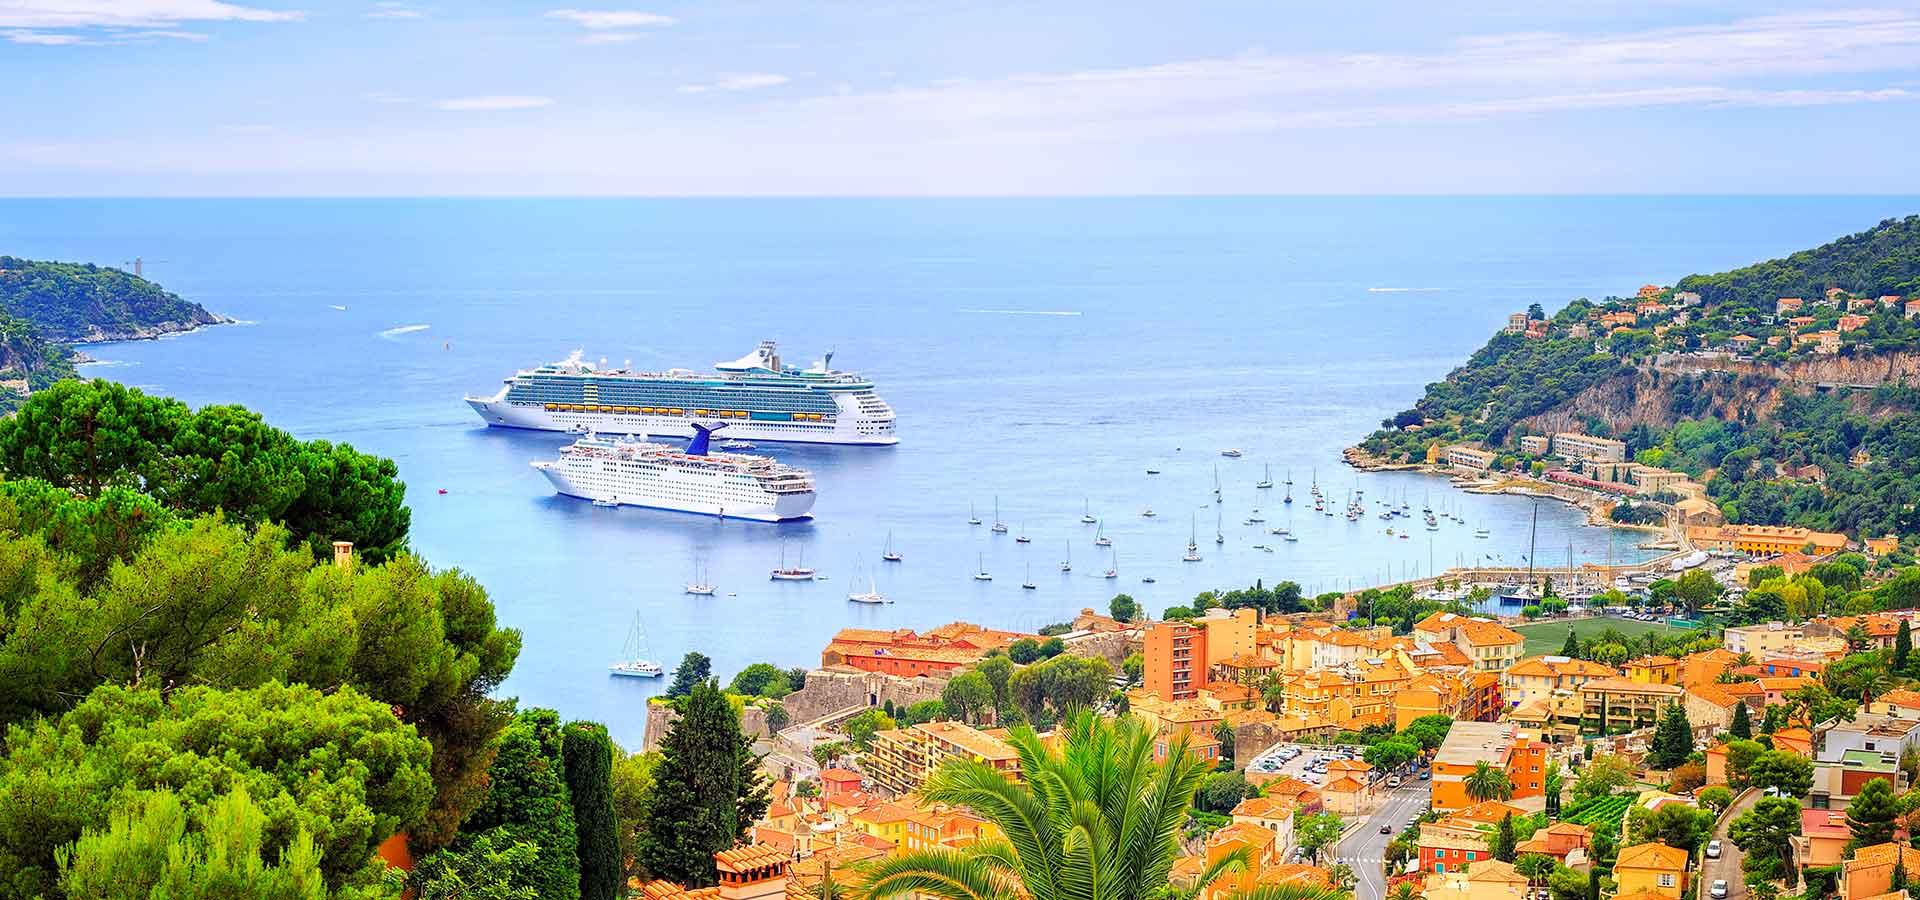 Voyage-croisieres-maritimes-fluviales-catamaran